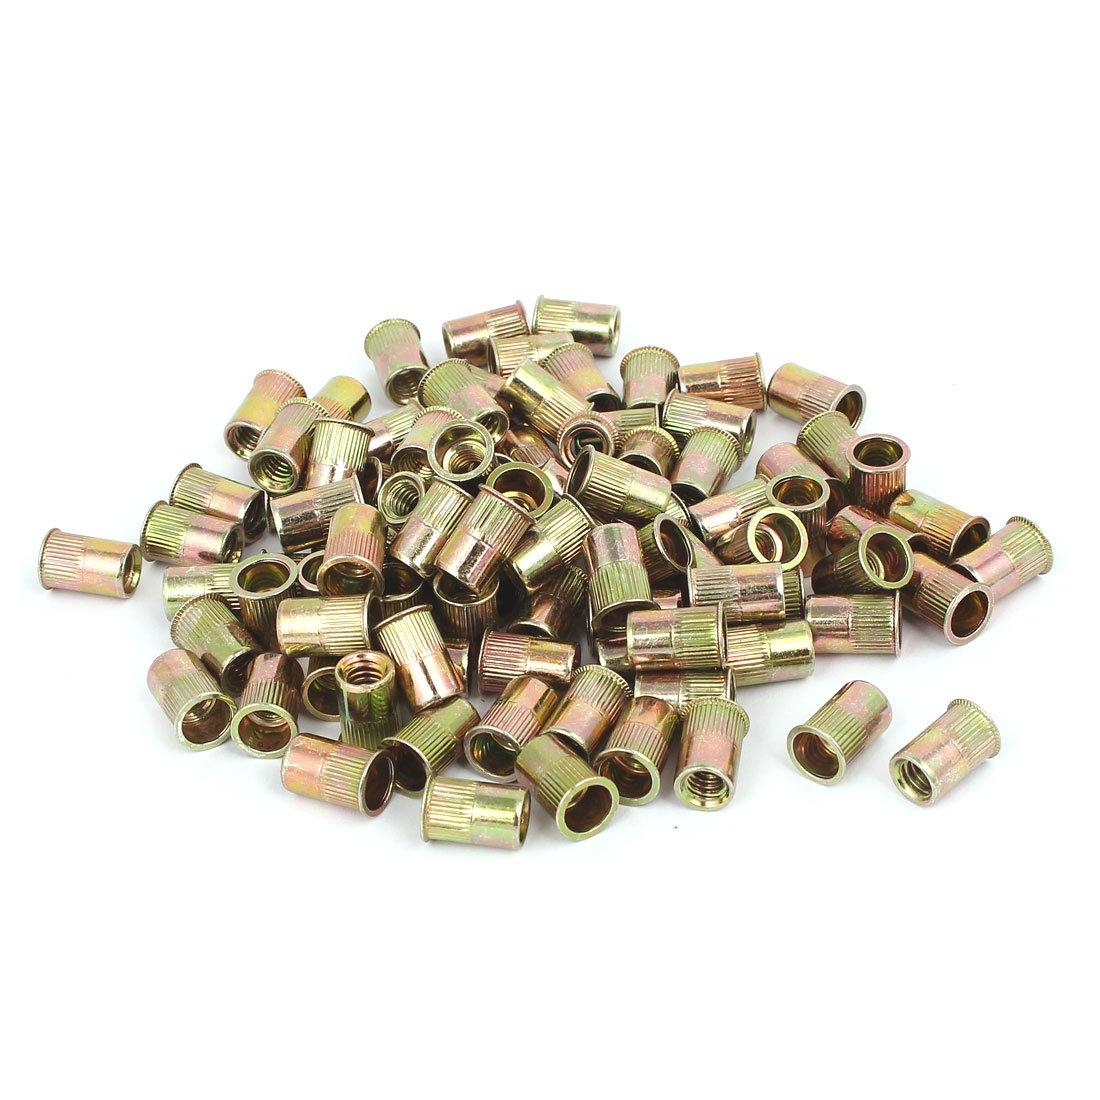 uxcell 1/4 Inch Straight Knurled Reduced Head Rivet Nut Nutsert Bronze Tone 100pcs